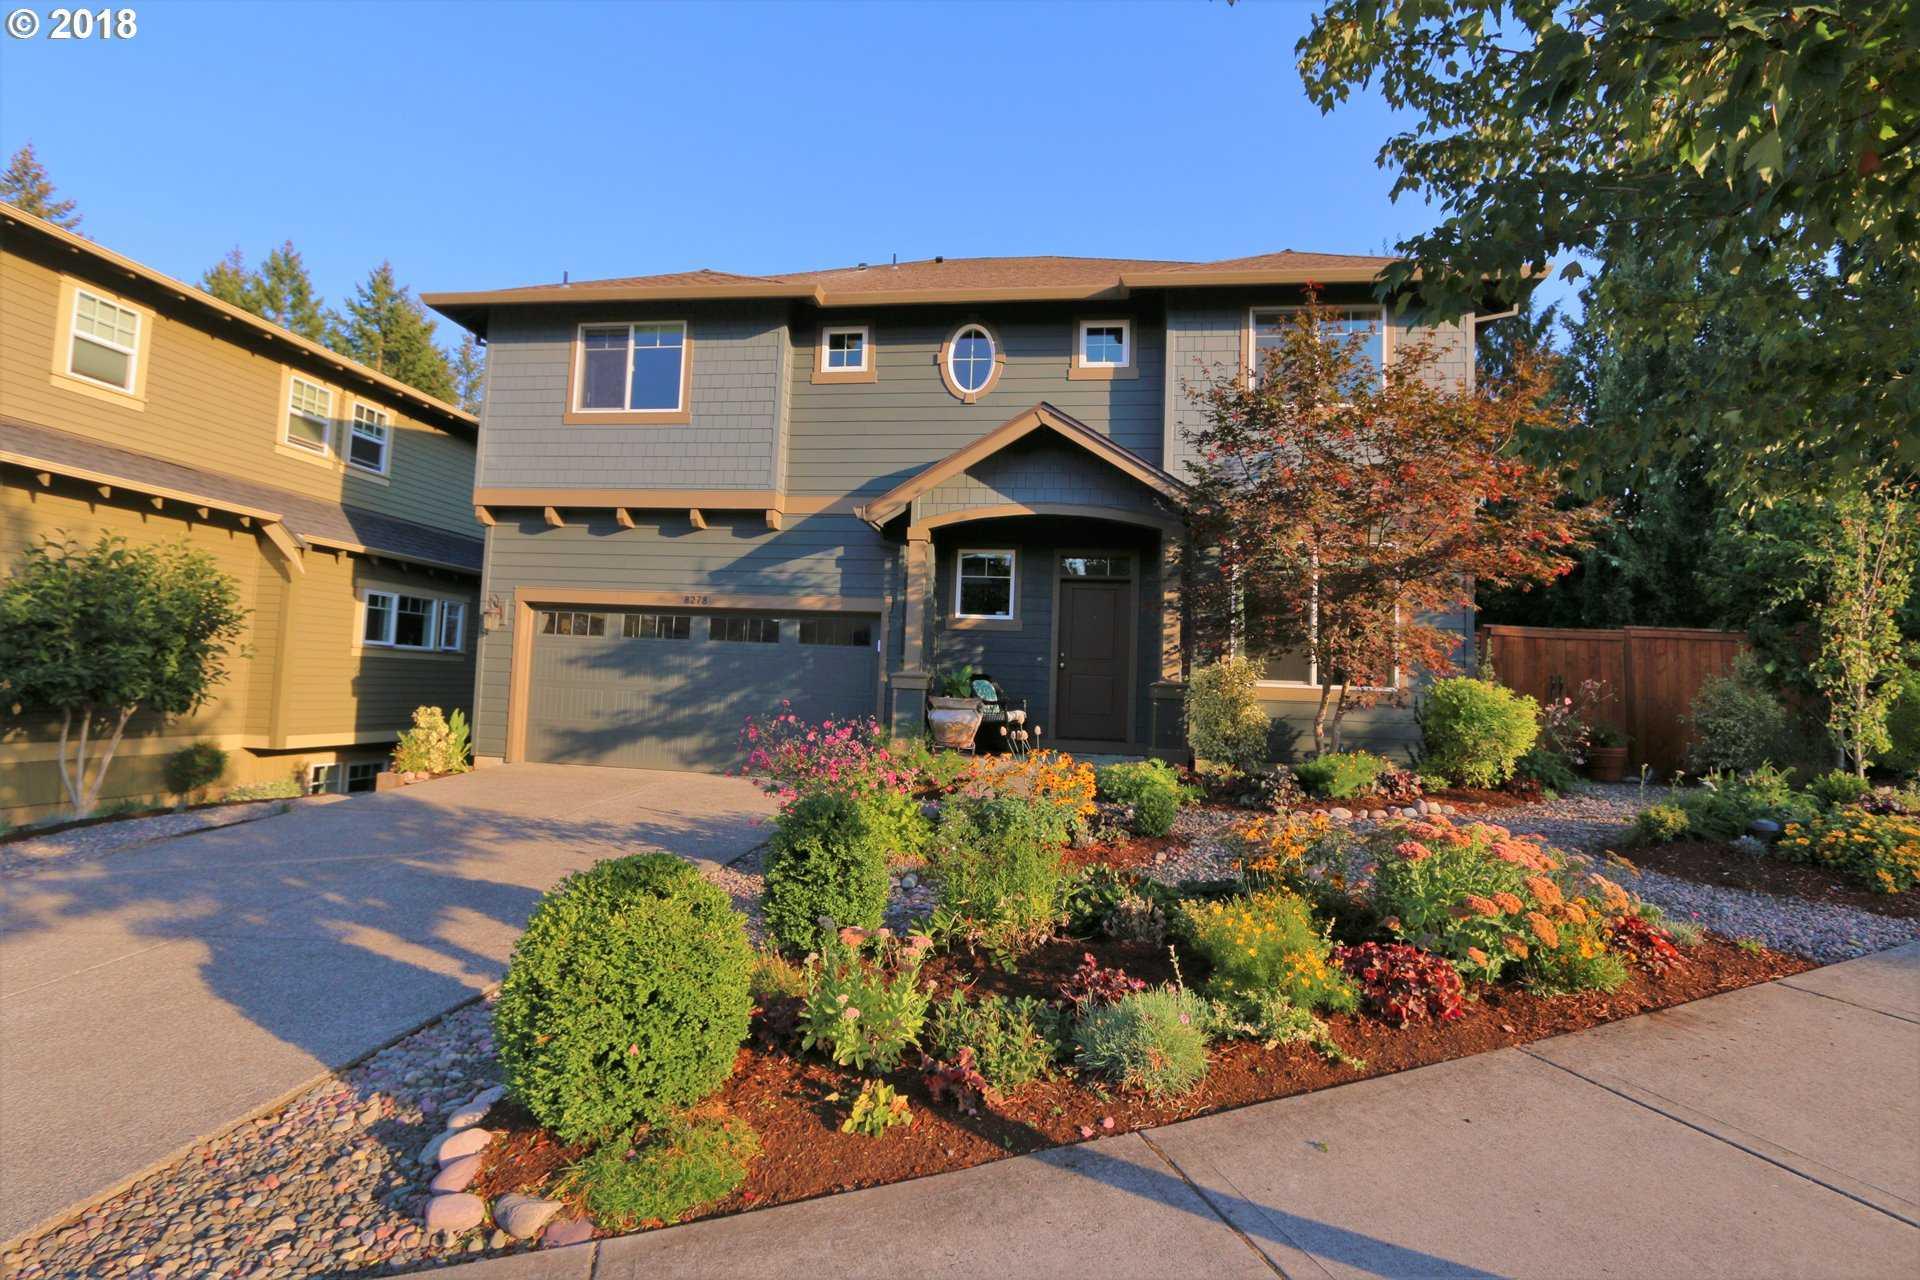 $494,900 - 5Br/3Ba -  for Sale in Indigo Range, Beaverton